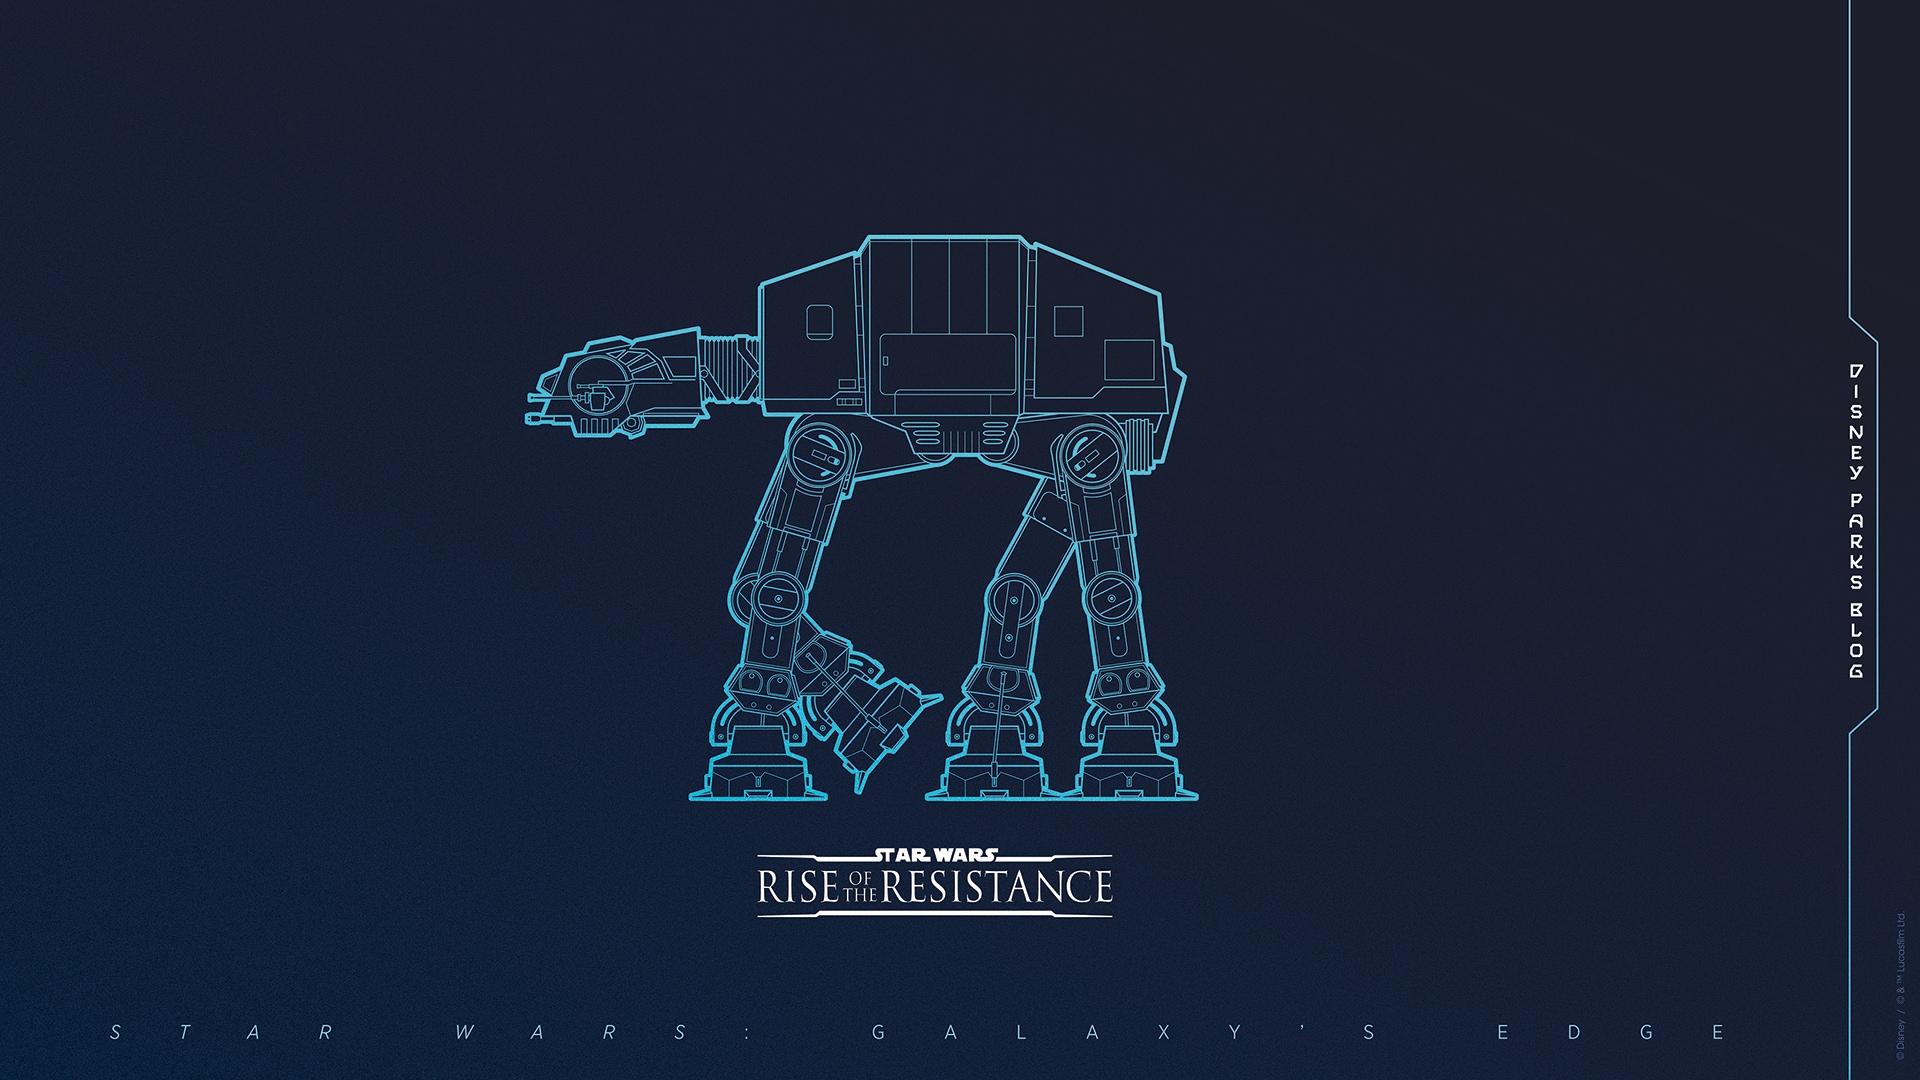 Star Wars Rise Of The Resistance Desktop Ipad Wallpapers Disney Parks Blog